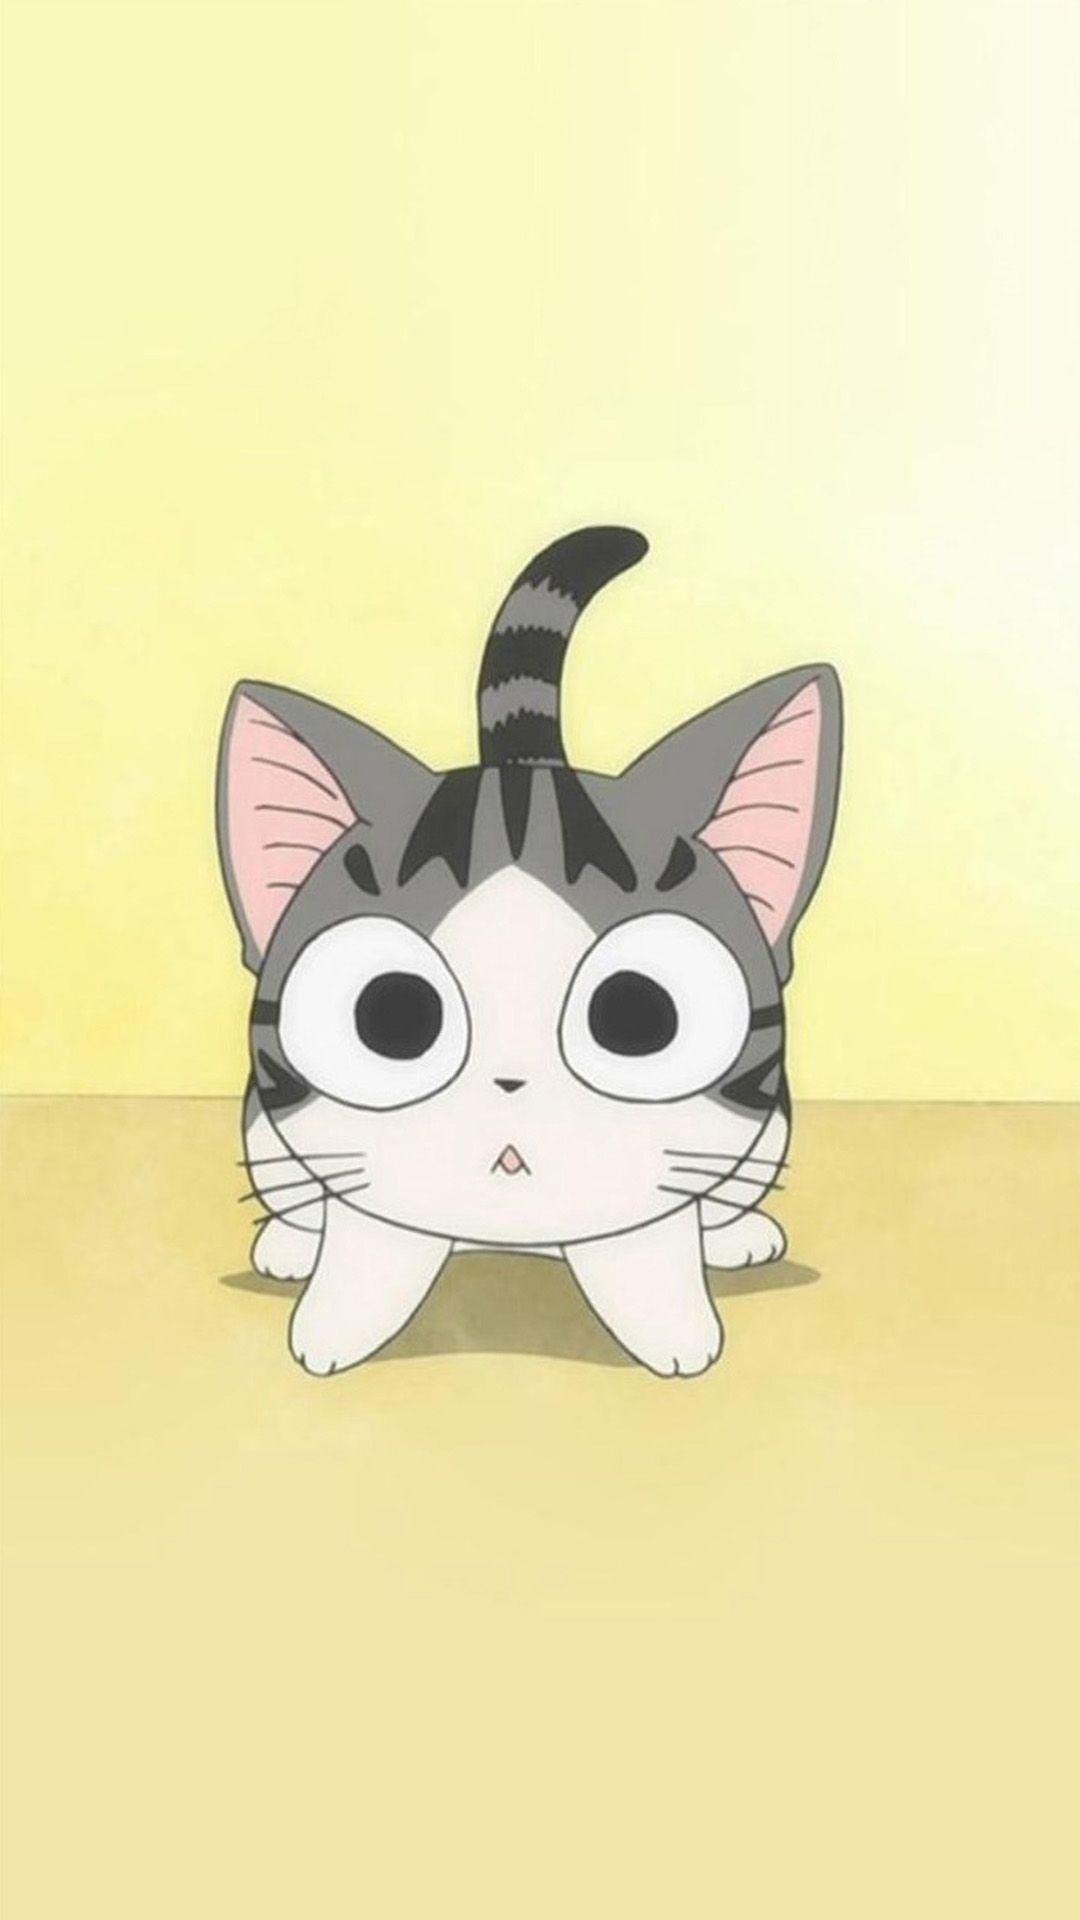 Super cute cartoon wallpapers collection cute cartoon - Cartoon cat background ...